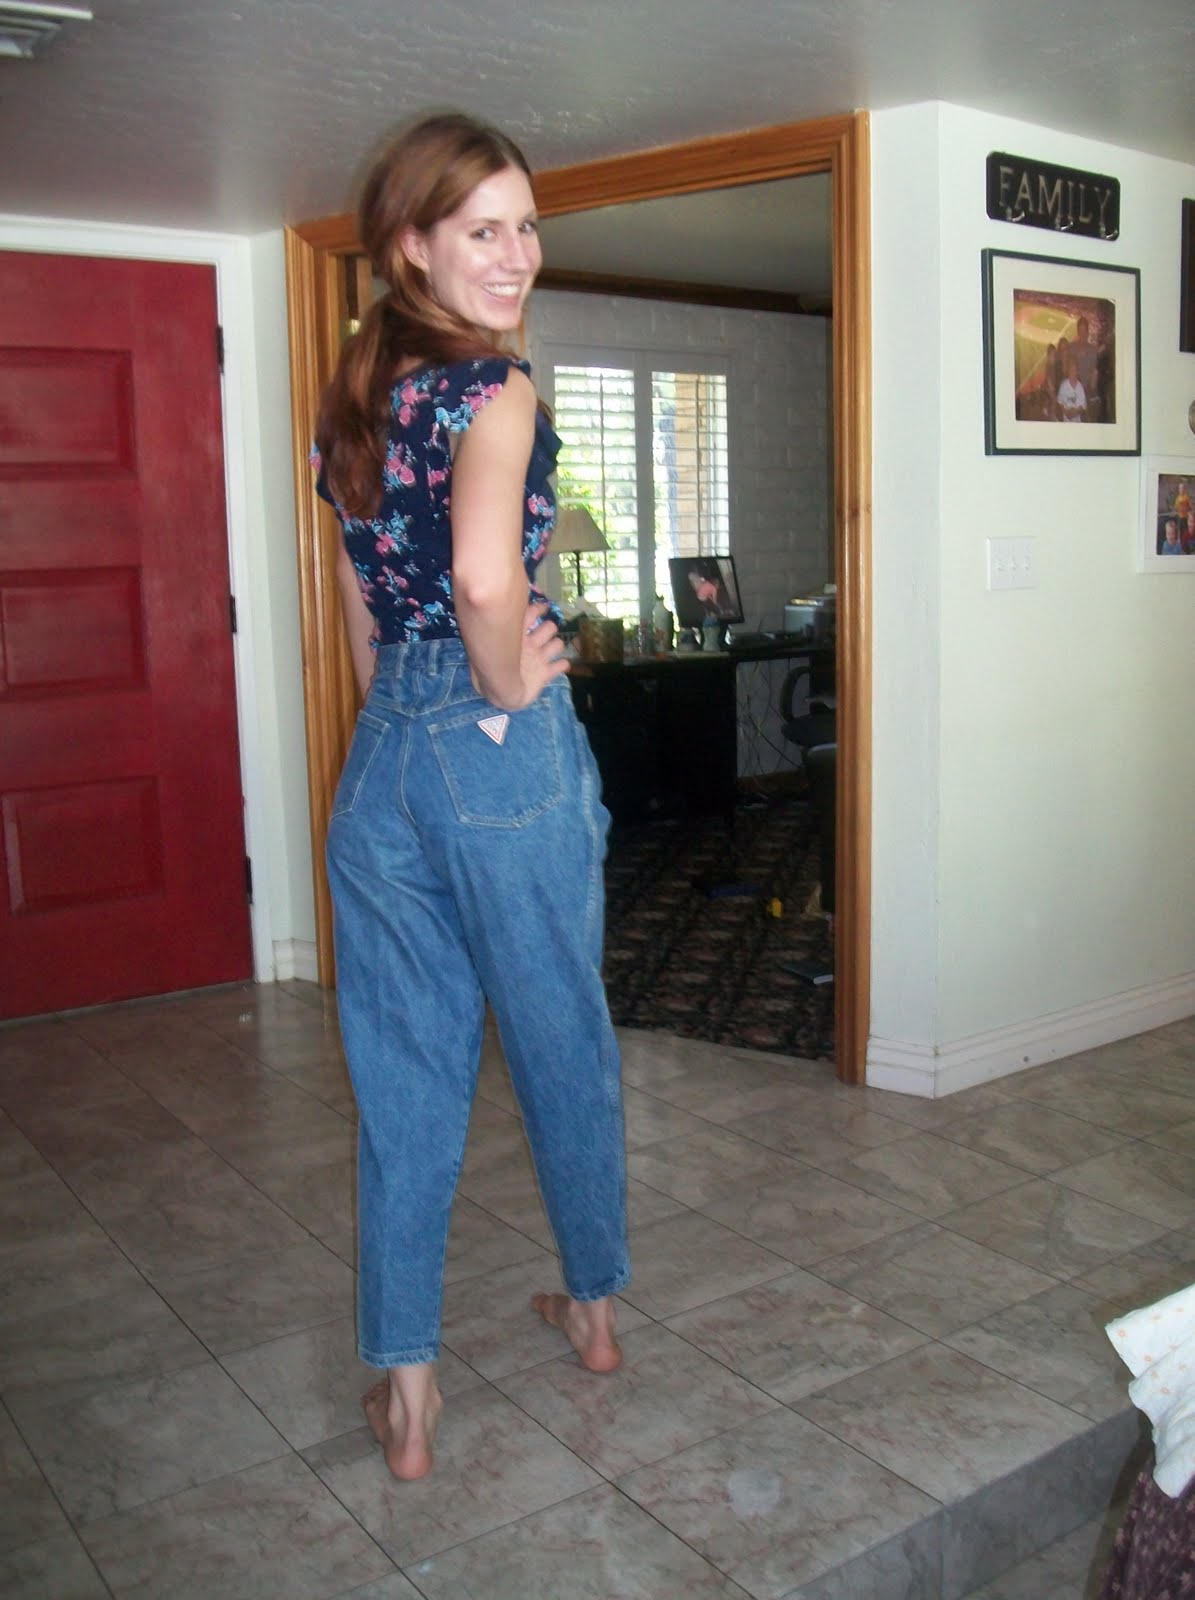 Lauren Graham Jeans Nasty jeans, just for fun. Lauren Graham Bad Santa Lauren Graham Bad Santa